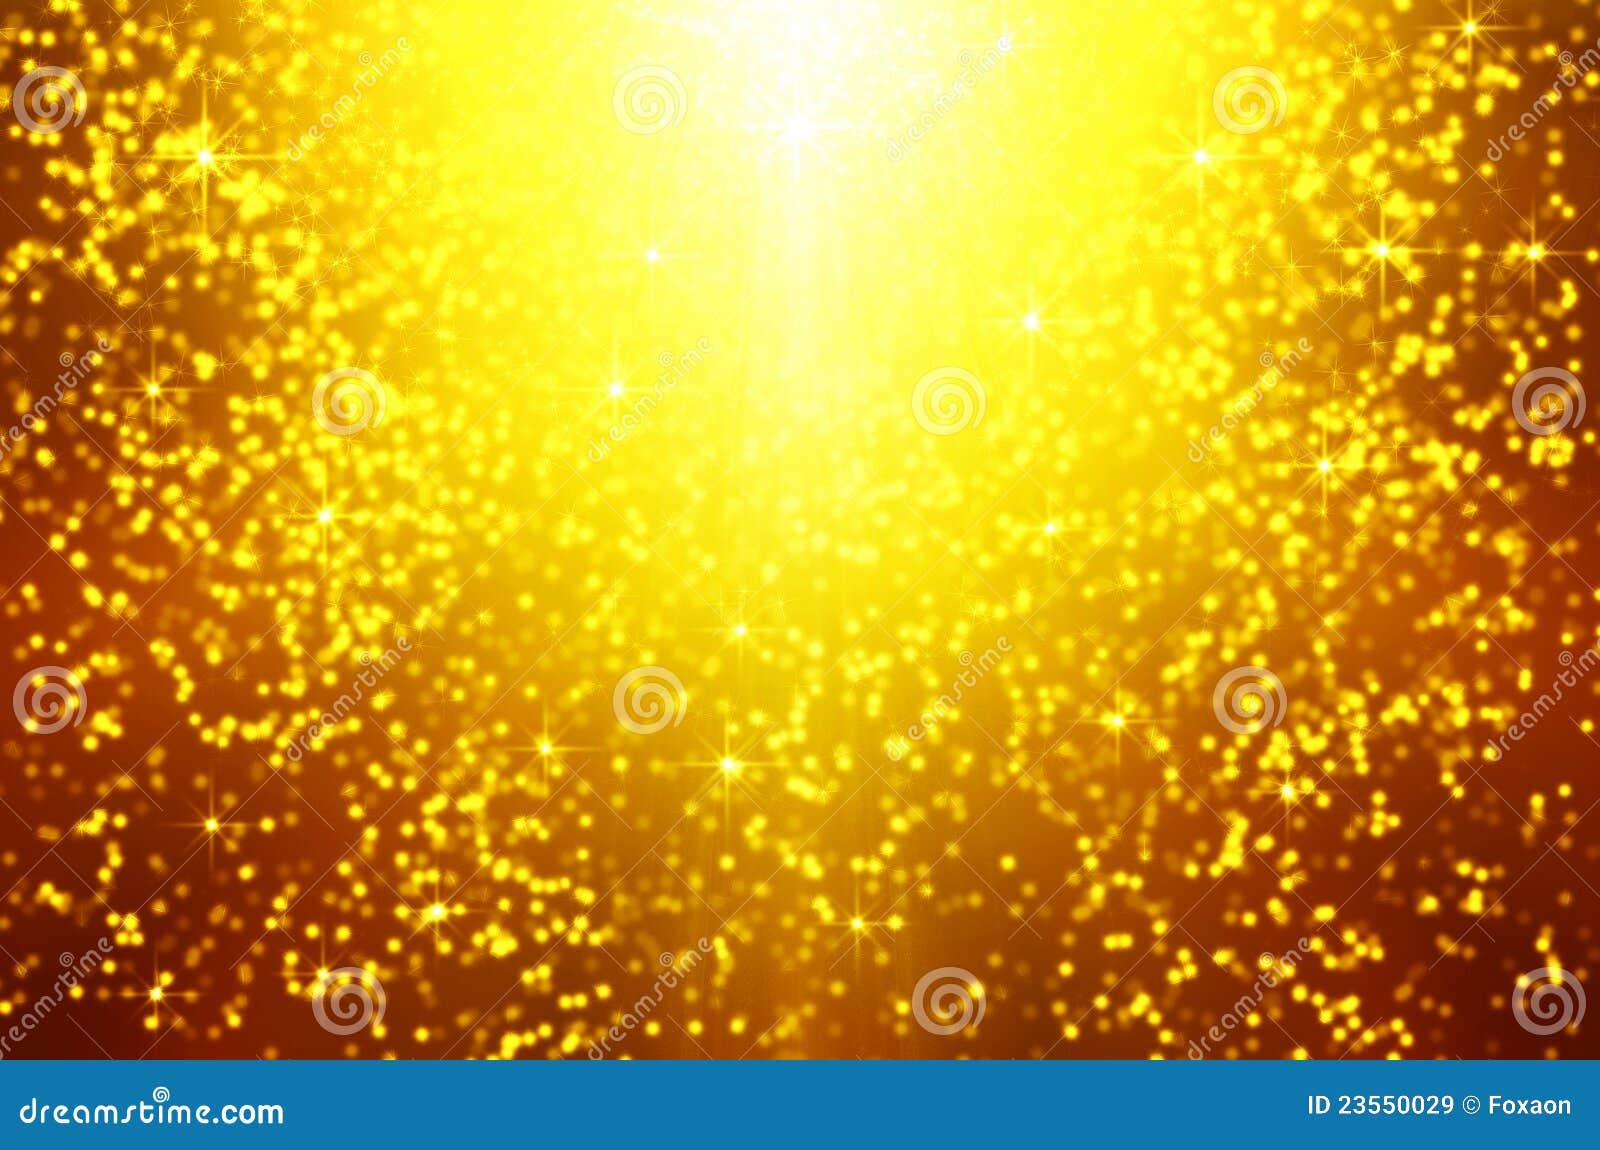 Royalty-Free Stock Photo. Download Glitter Of Golden Christmas Lighting Background ... & Glitter Of Golden Christmas Lighting Background Stock Image ... azcodes.com